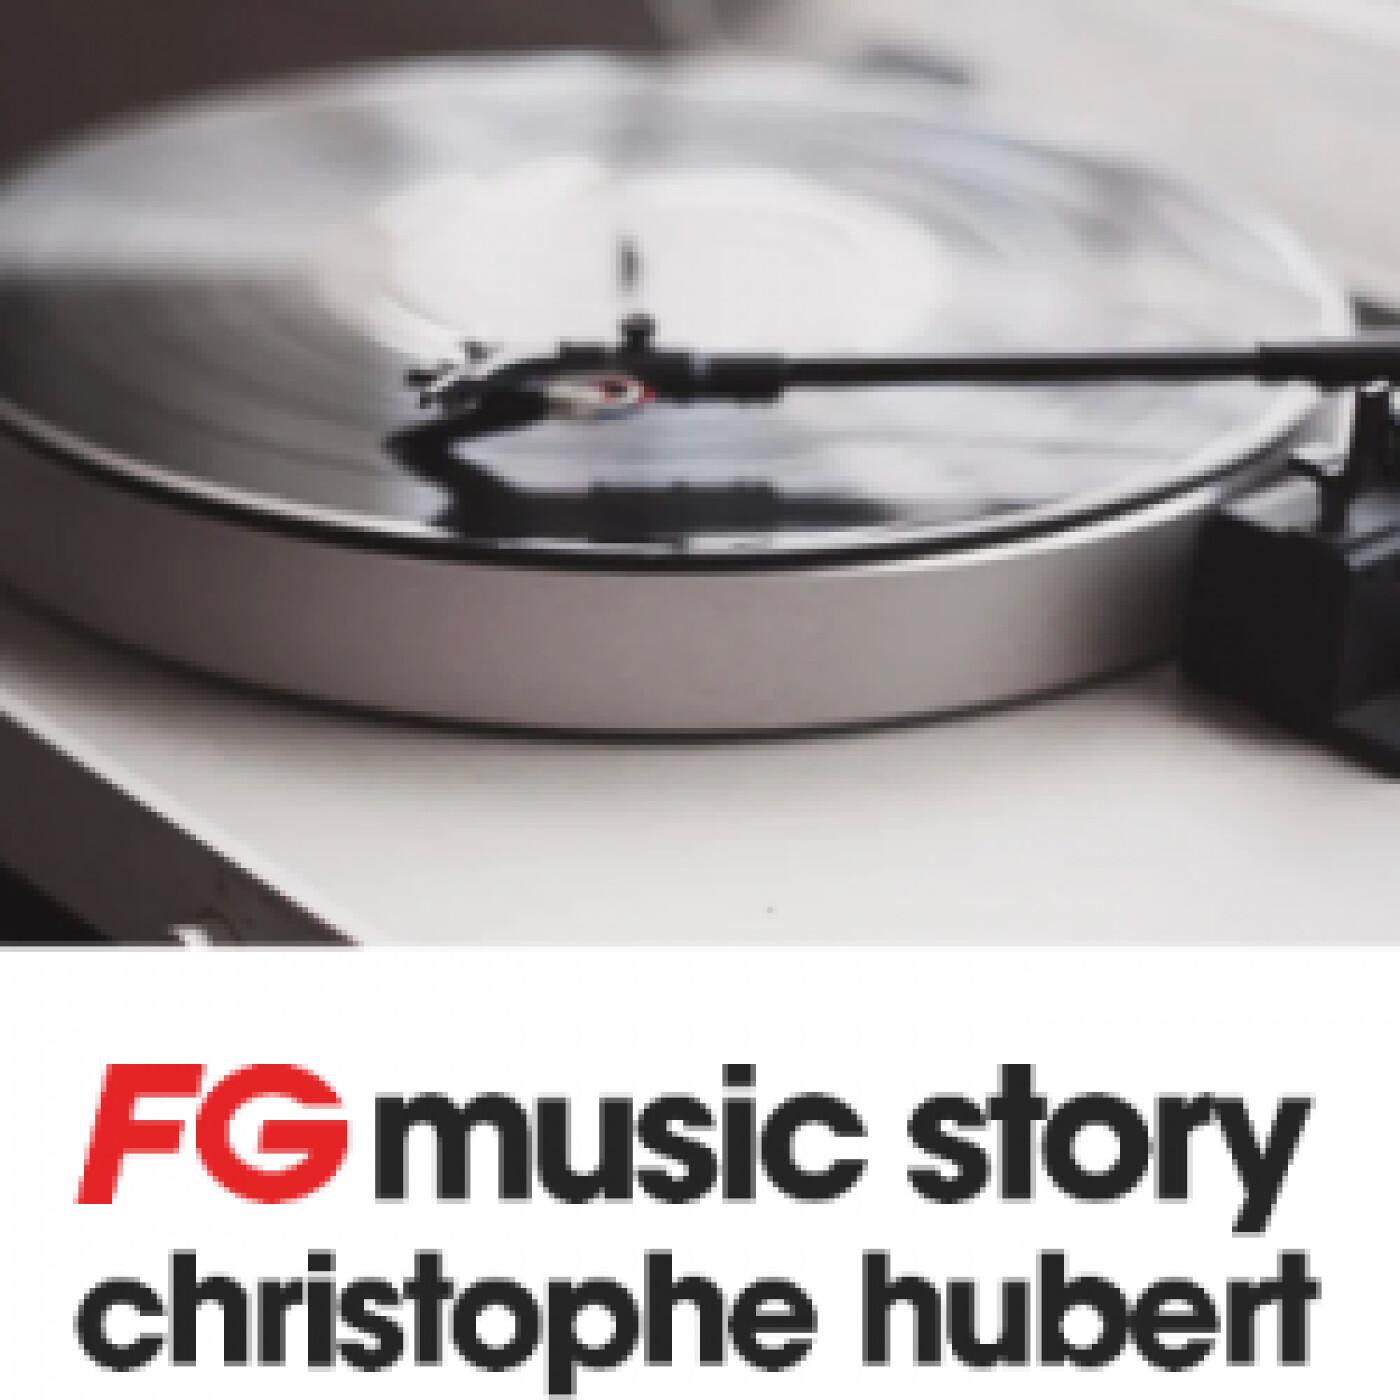 FG MUSIC STORY : ARTBAT